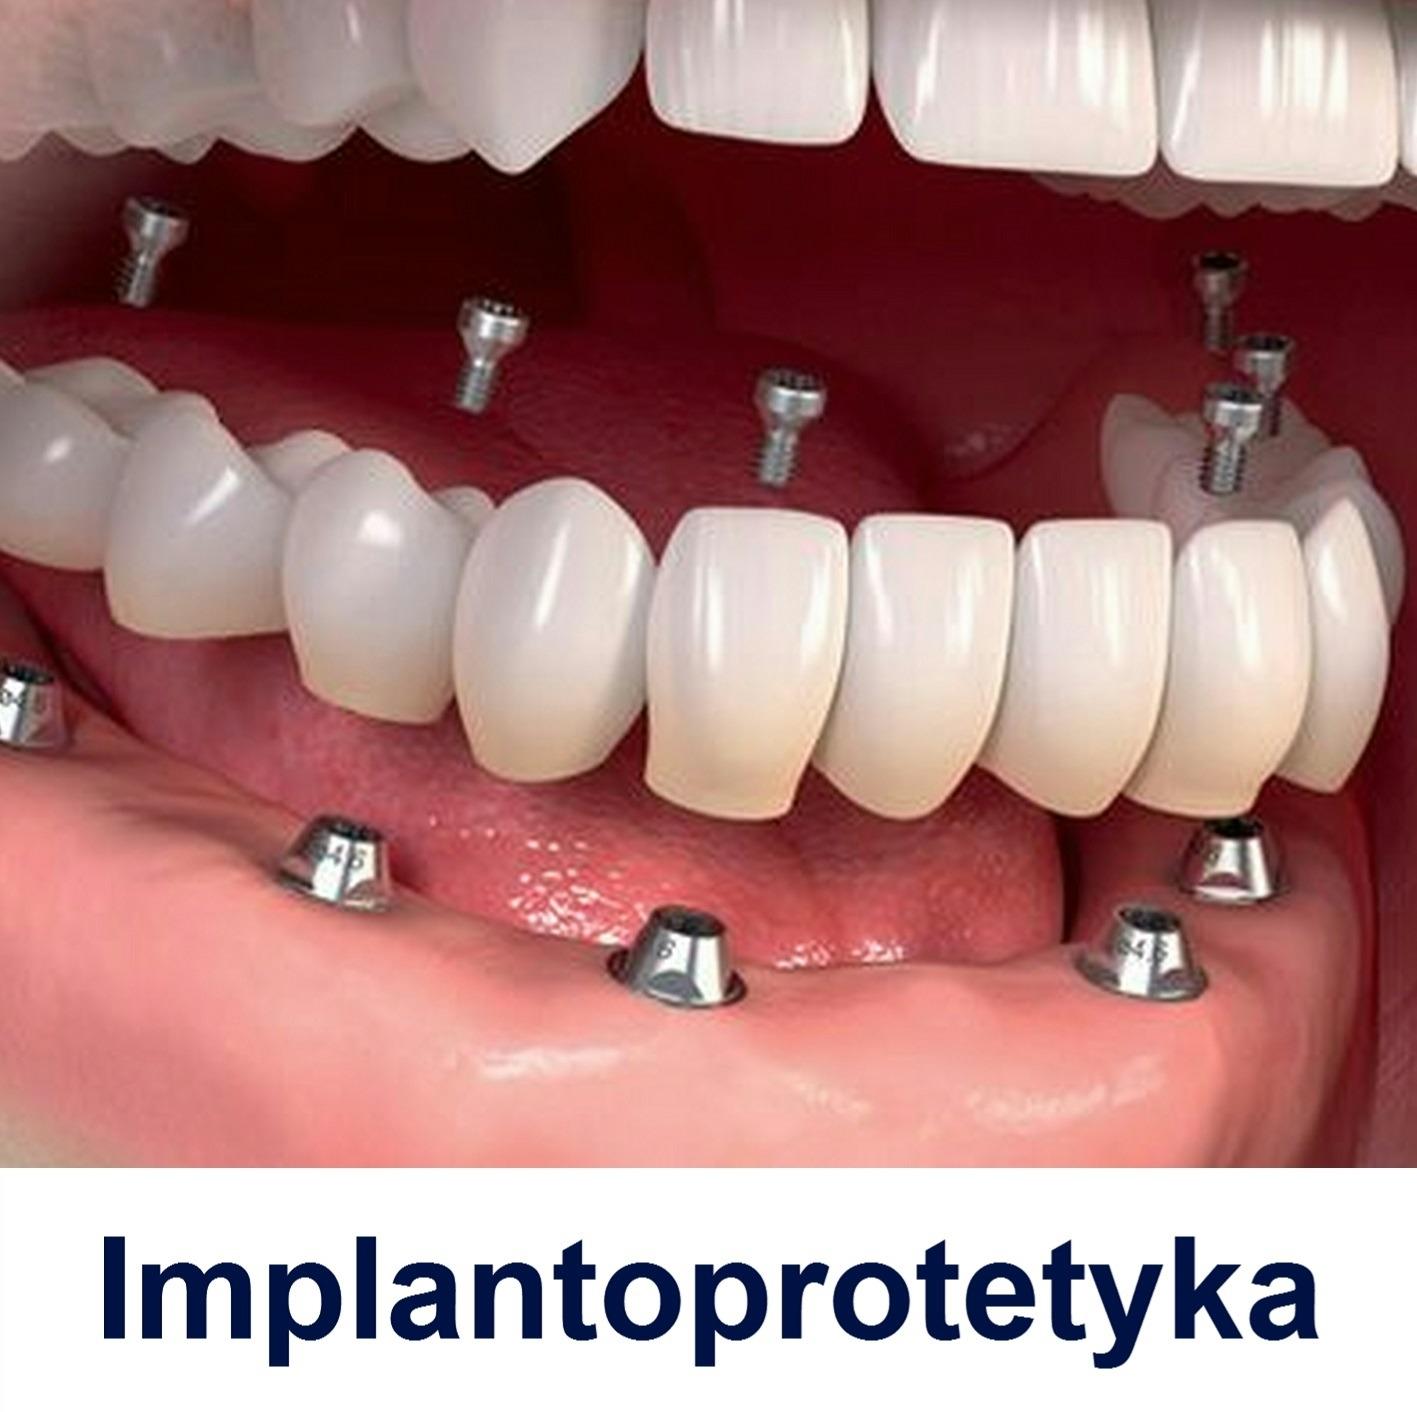 http://curodental.com/proteza-na-implantach/